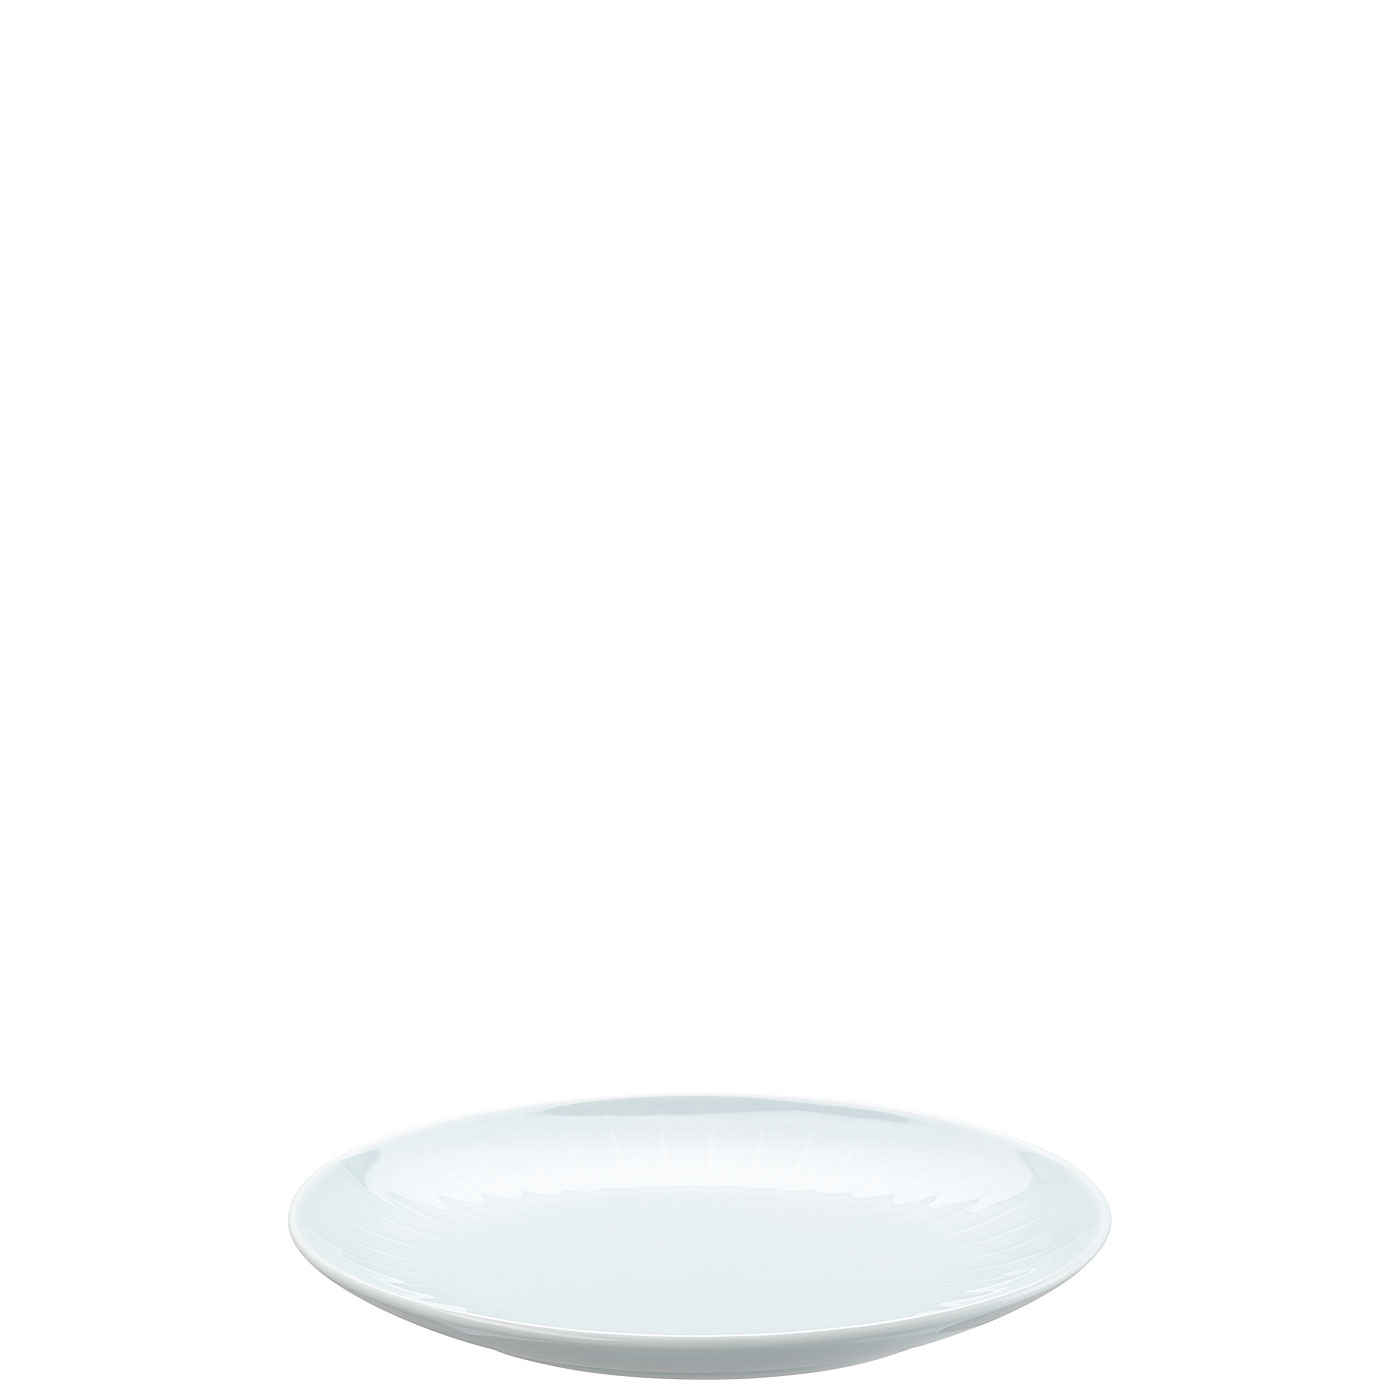 Teller flach 20 cm Joyn Mint Green Arzberg